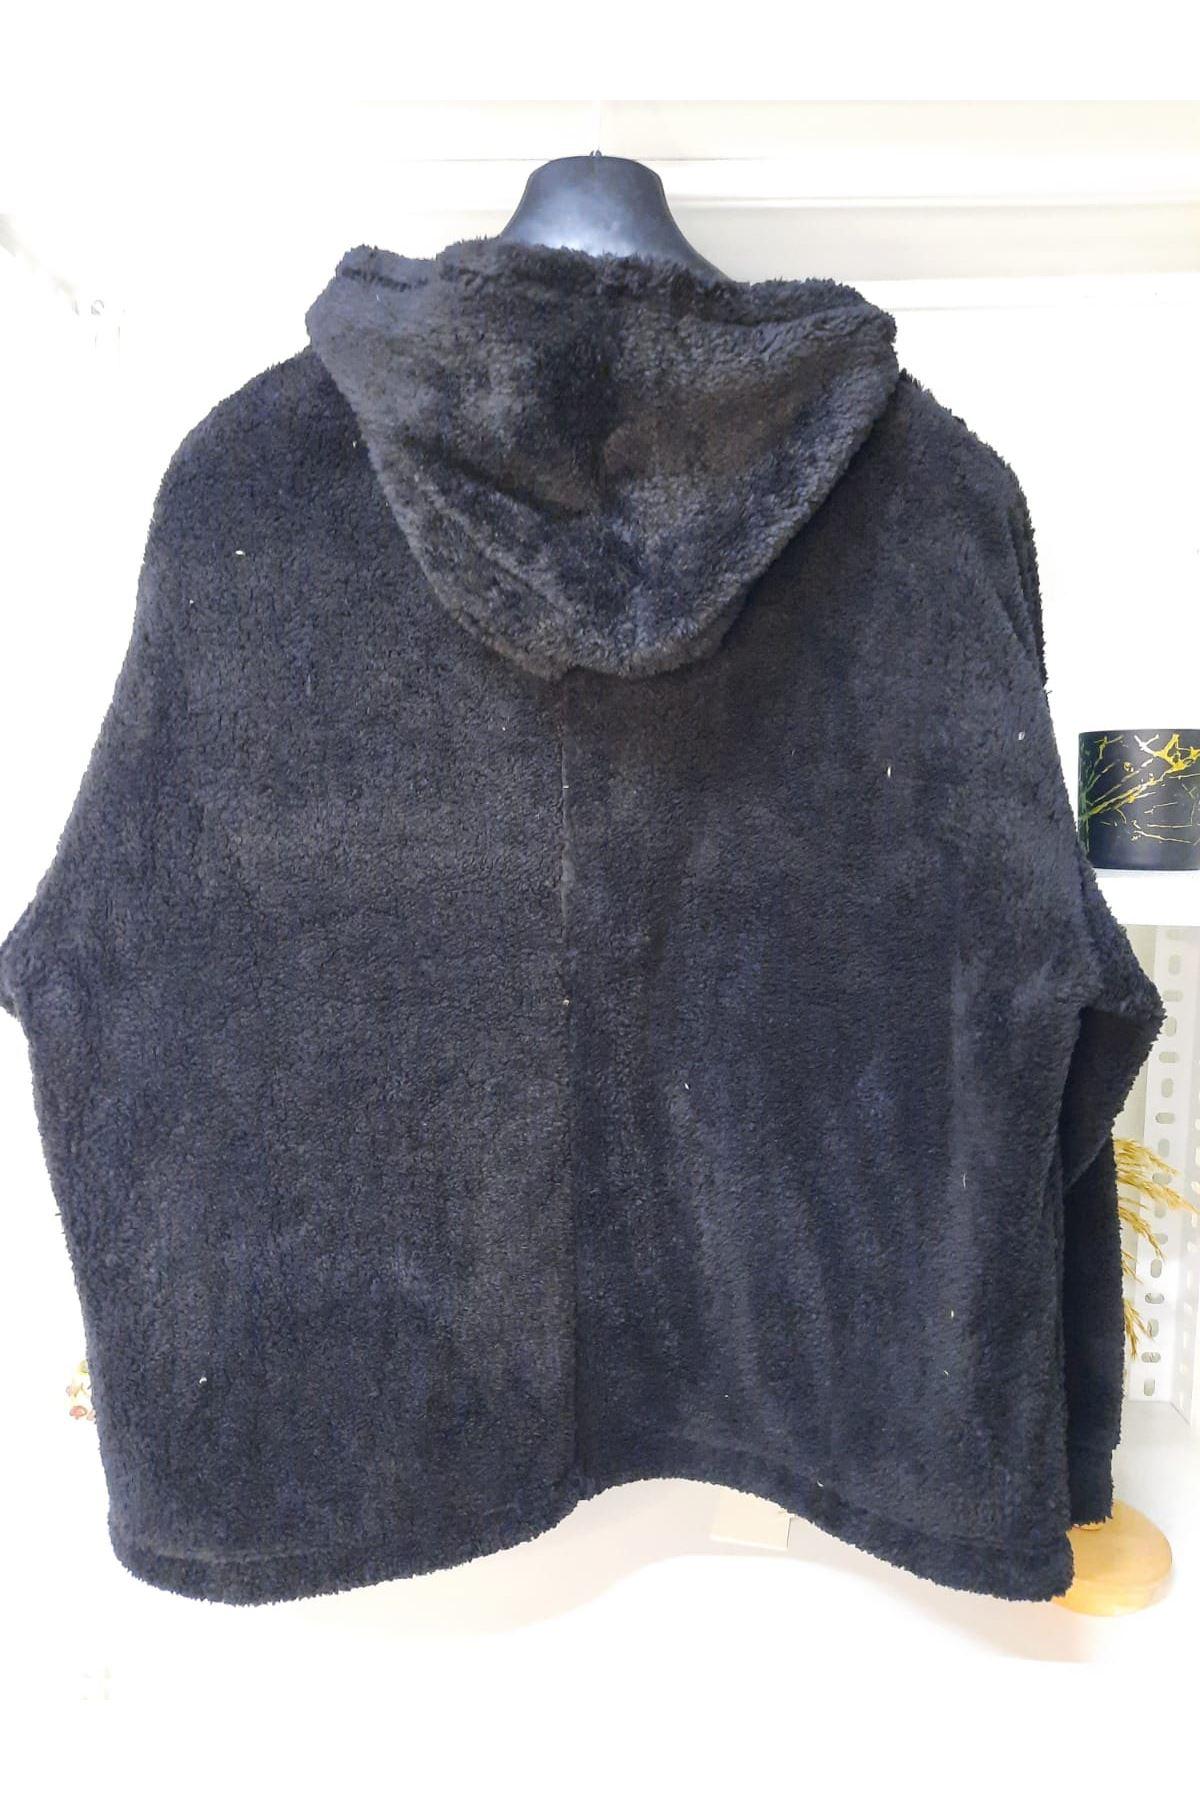 Yeni Sezon Peluş Ceket - SİYAH